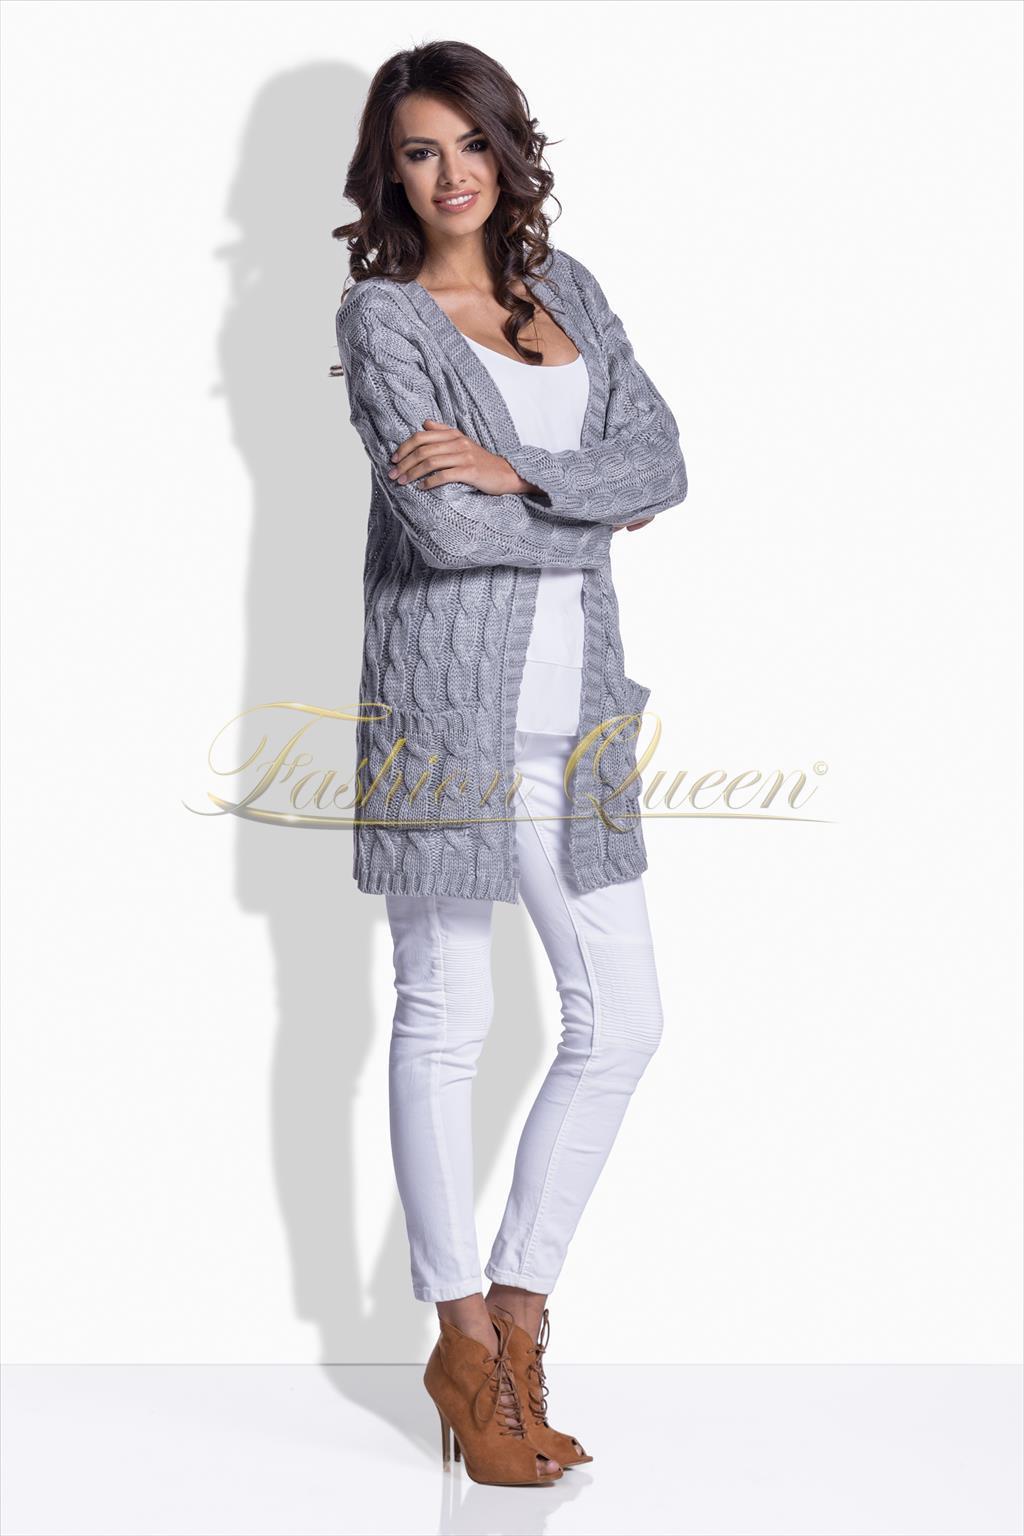 fe0ffd256443 Fashion Queen - Dámske oblečenie a móda - Dlhý sveter